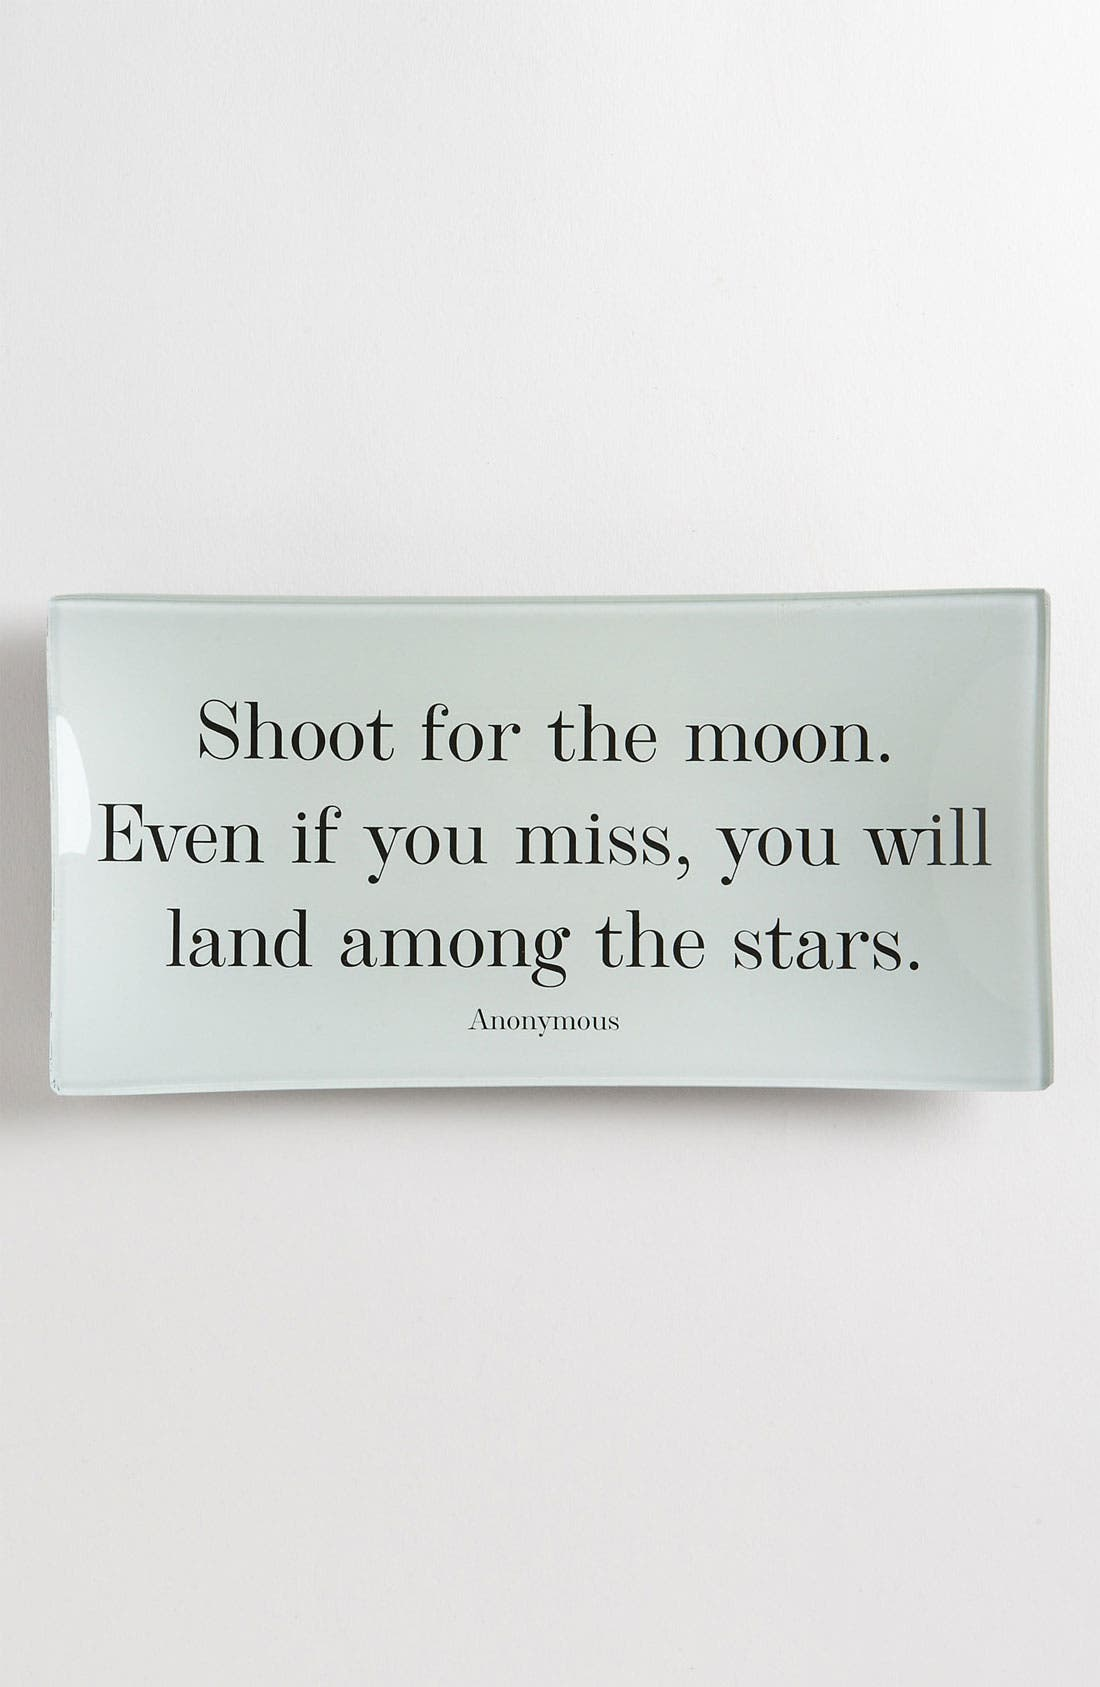 Alternate Image 1 Selected - Ben's Garden 'Shoot for the Moon' Tray